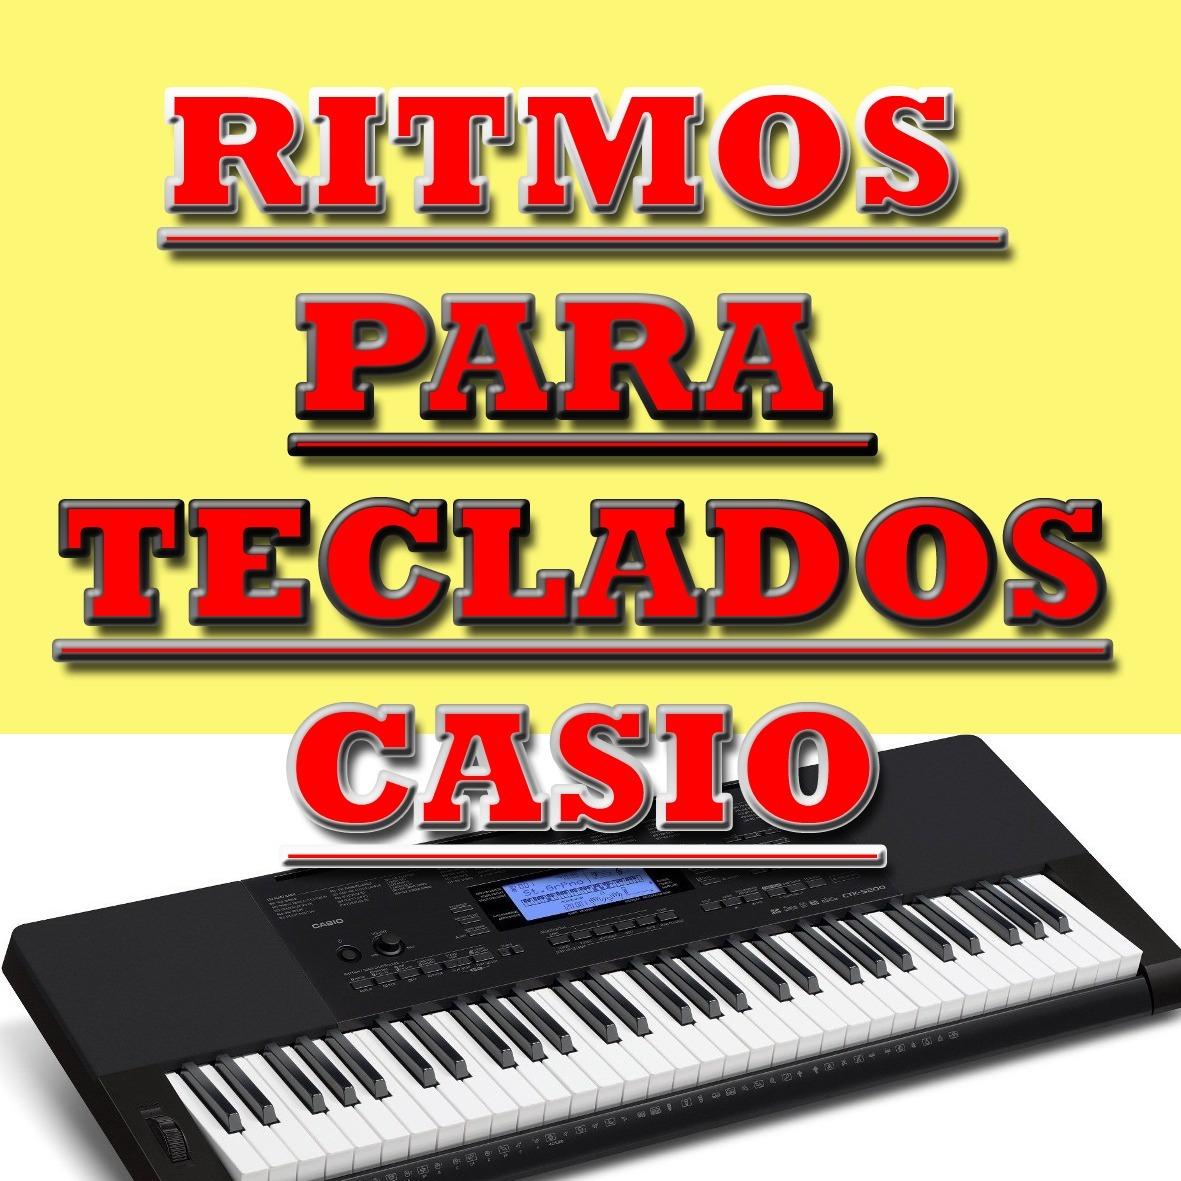 GRATIS DE SALES BAIXAR MUSICAS AS SILVANO TODAS